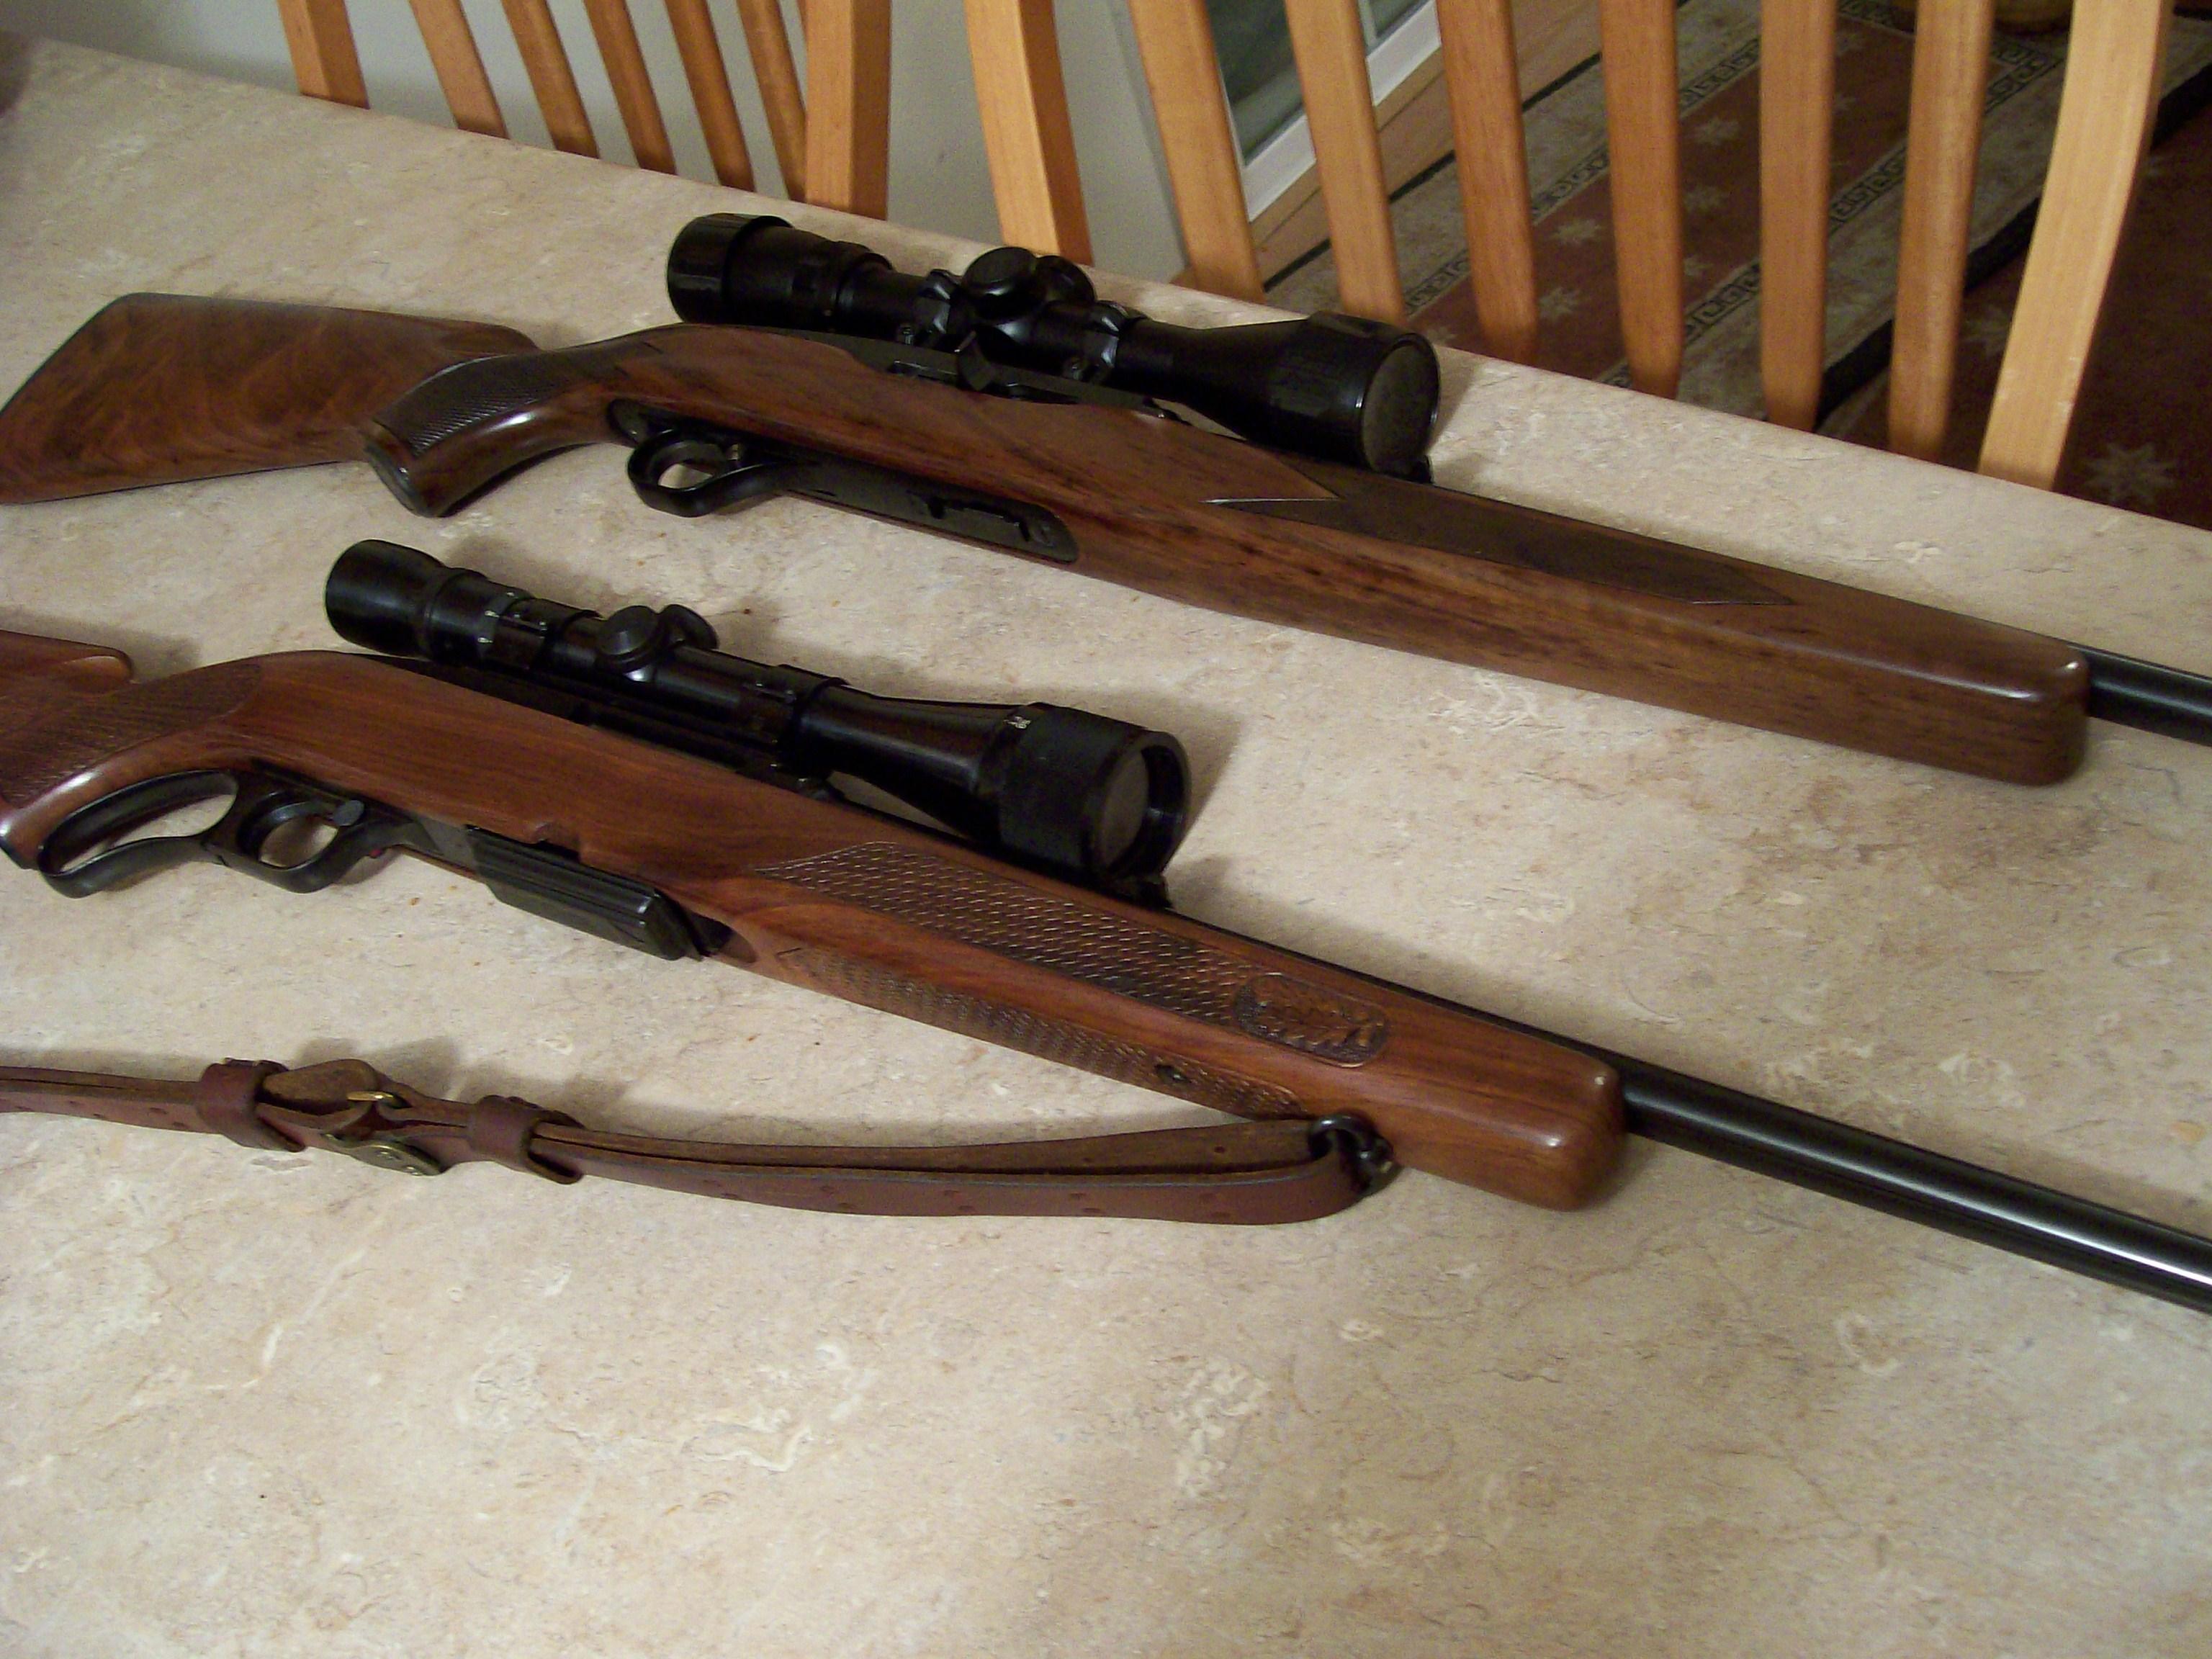 winchester model 490 gun and game the friendliest gun discussion